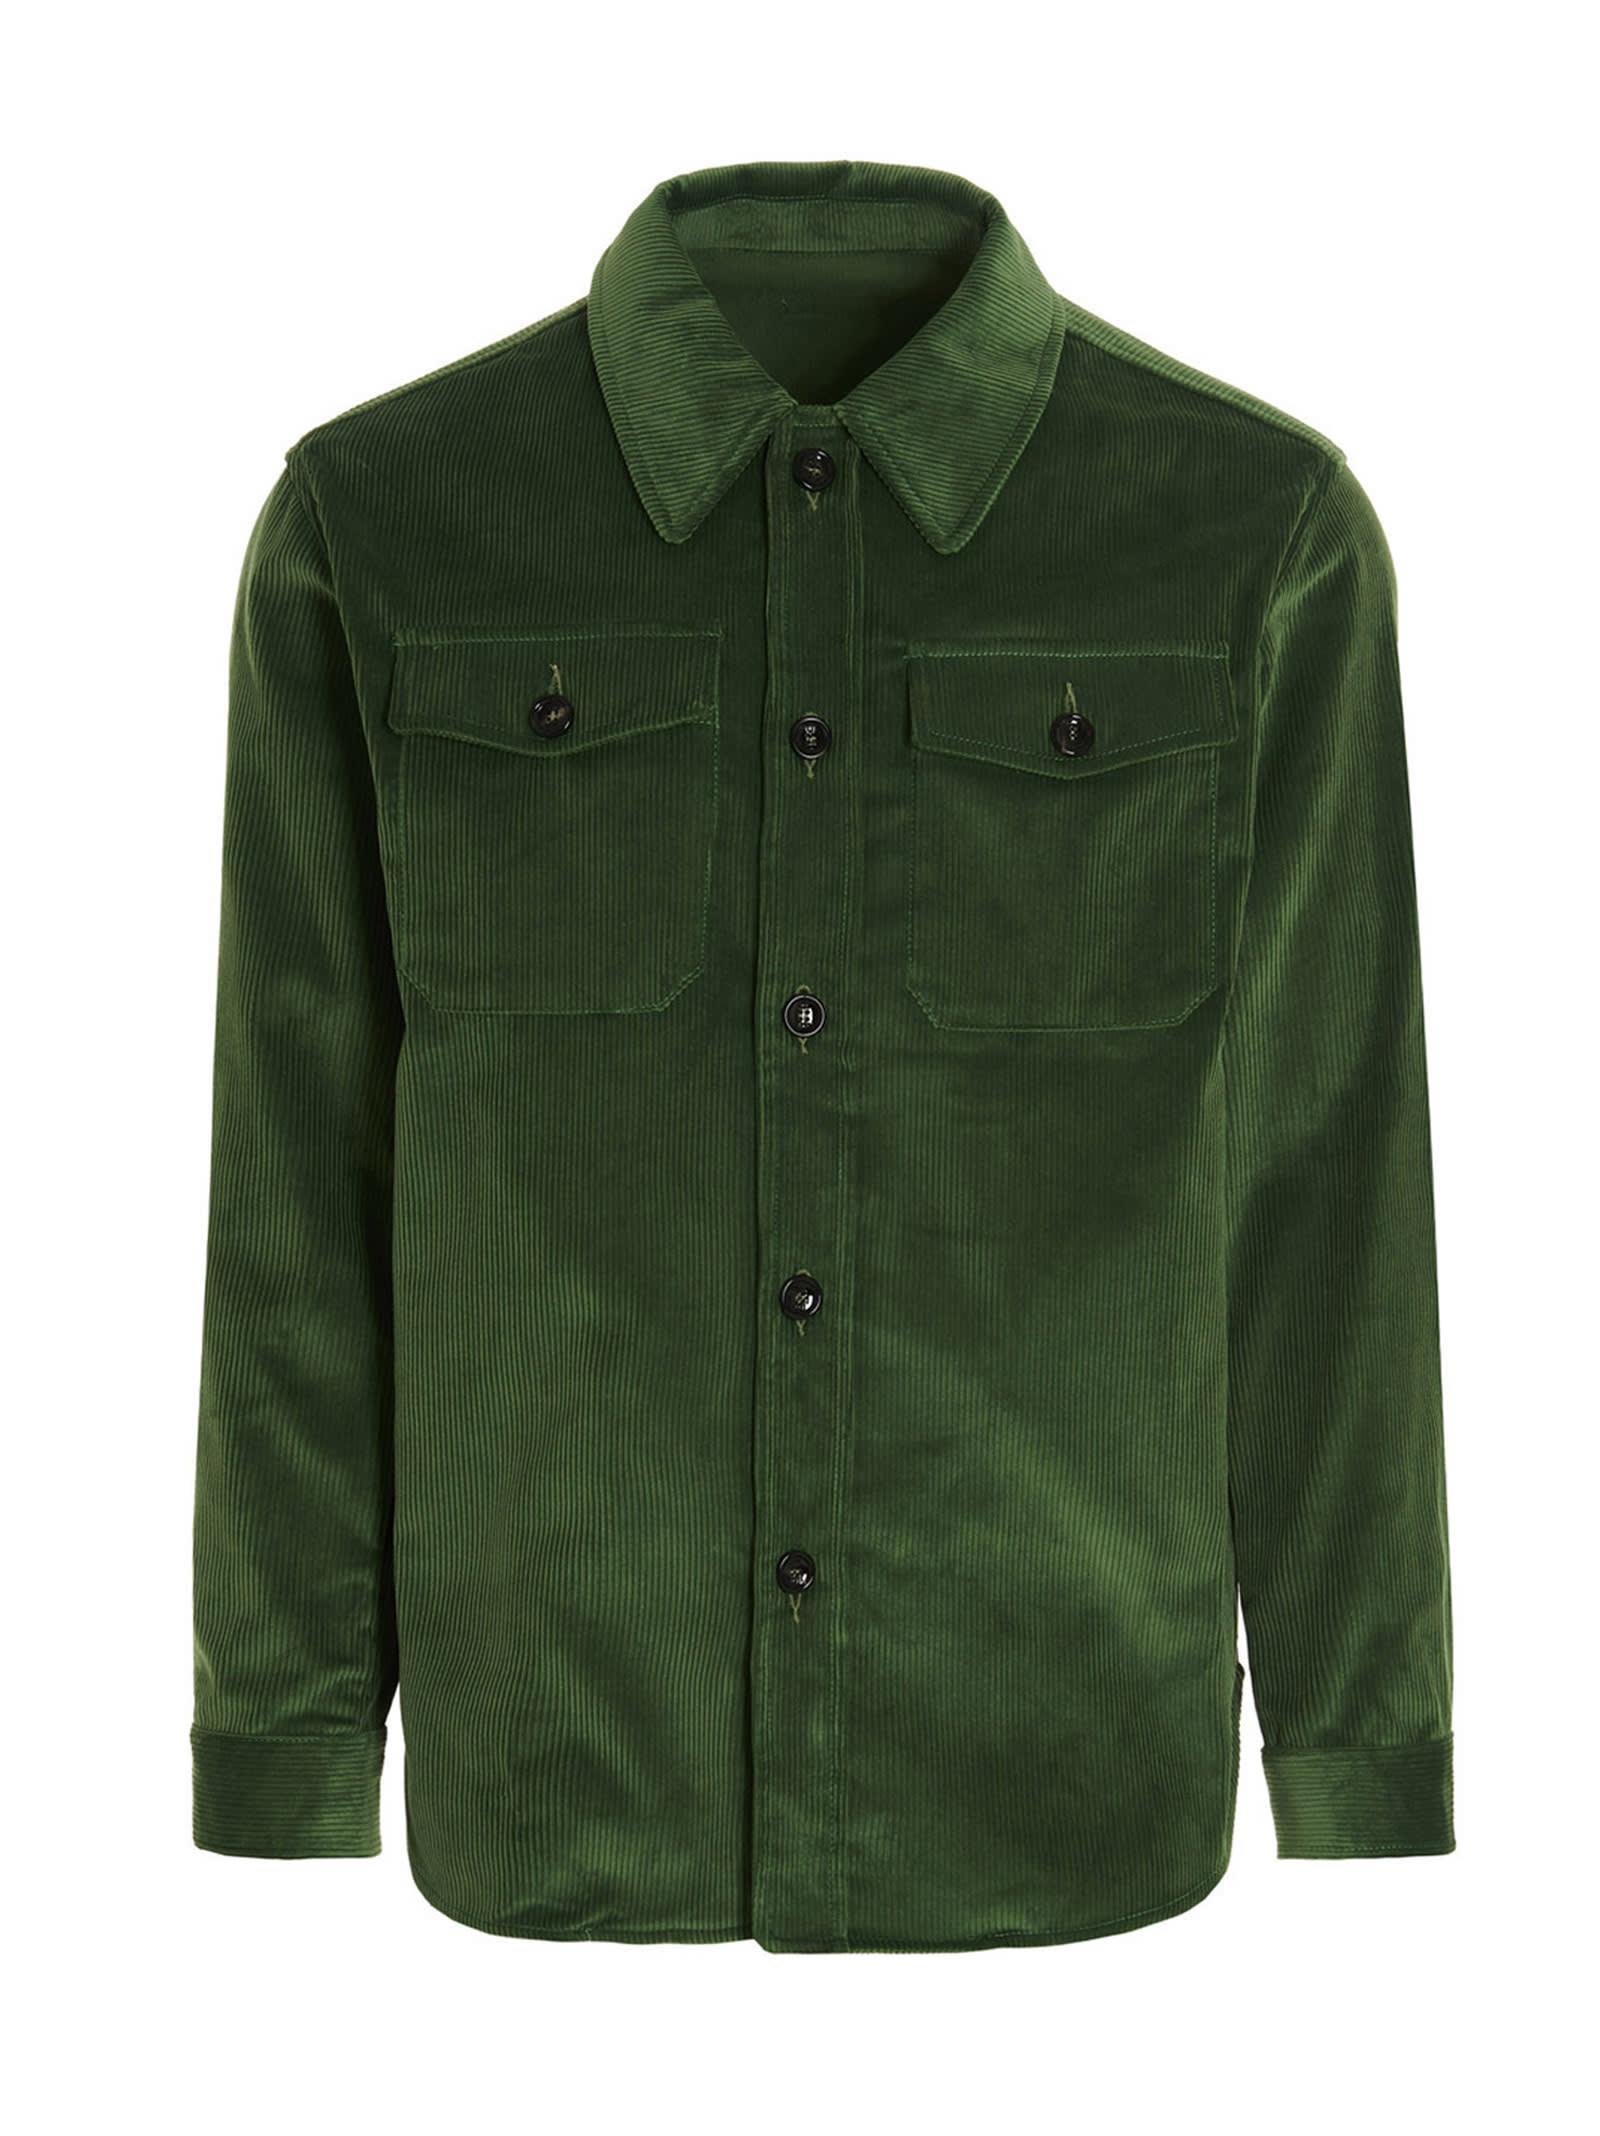 Lc23 Shirt